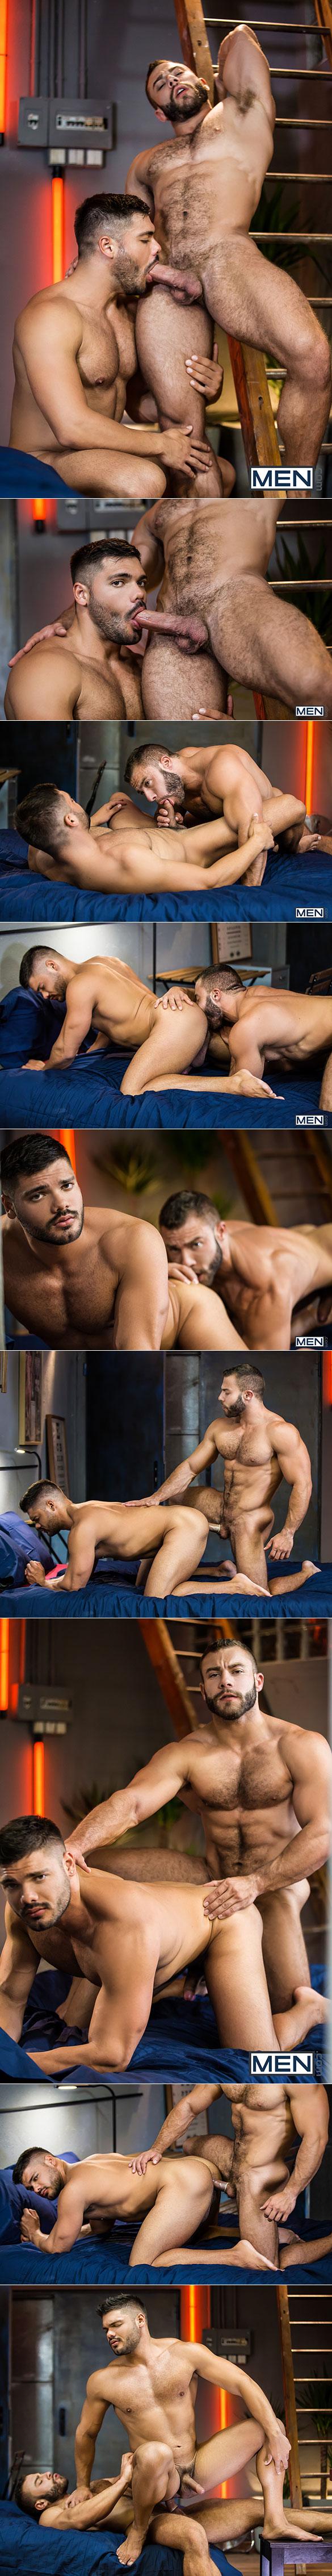 "Men.com: Diego Reyes fucks Nicolas Brooks in ""The Boy Is Mine, Part 2"""